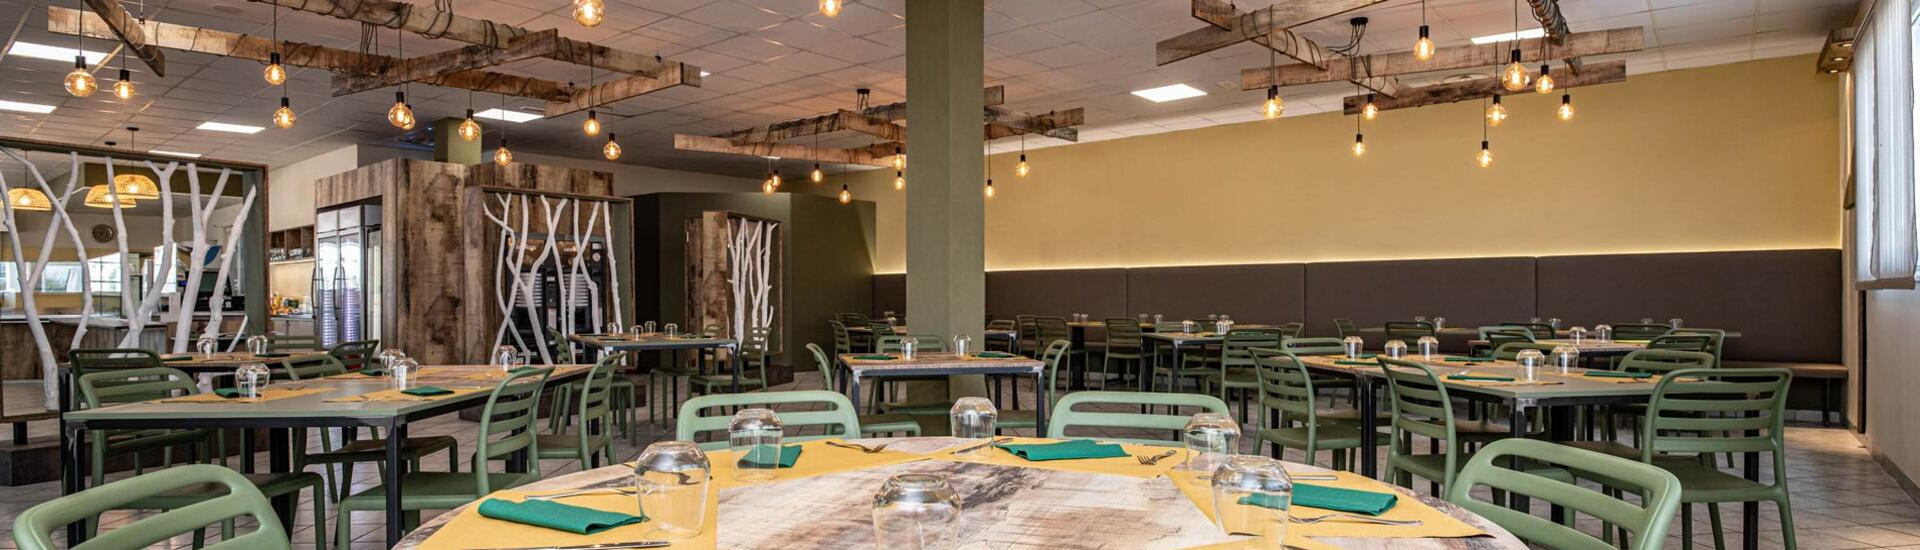 holidayfamilyvillage fr restaurant-shopping 012